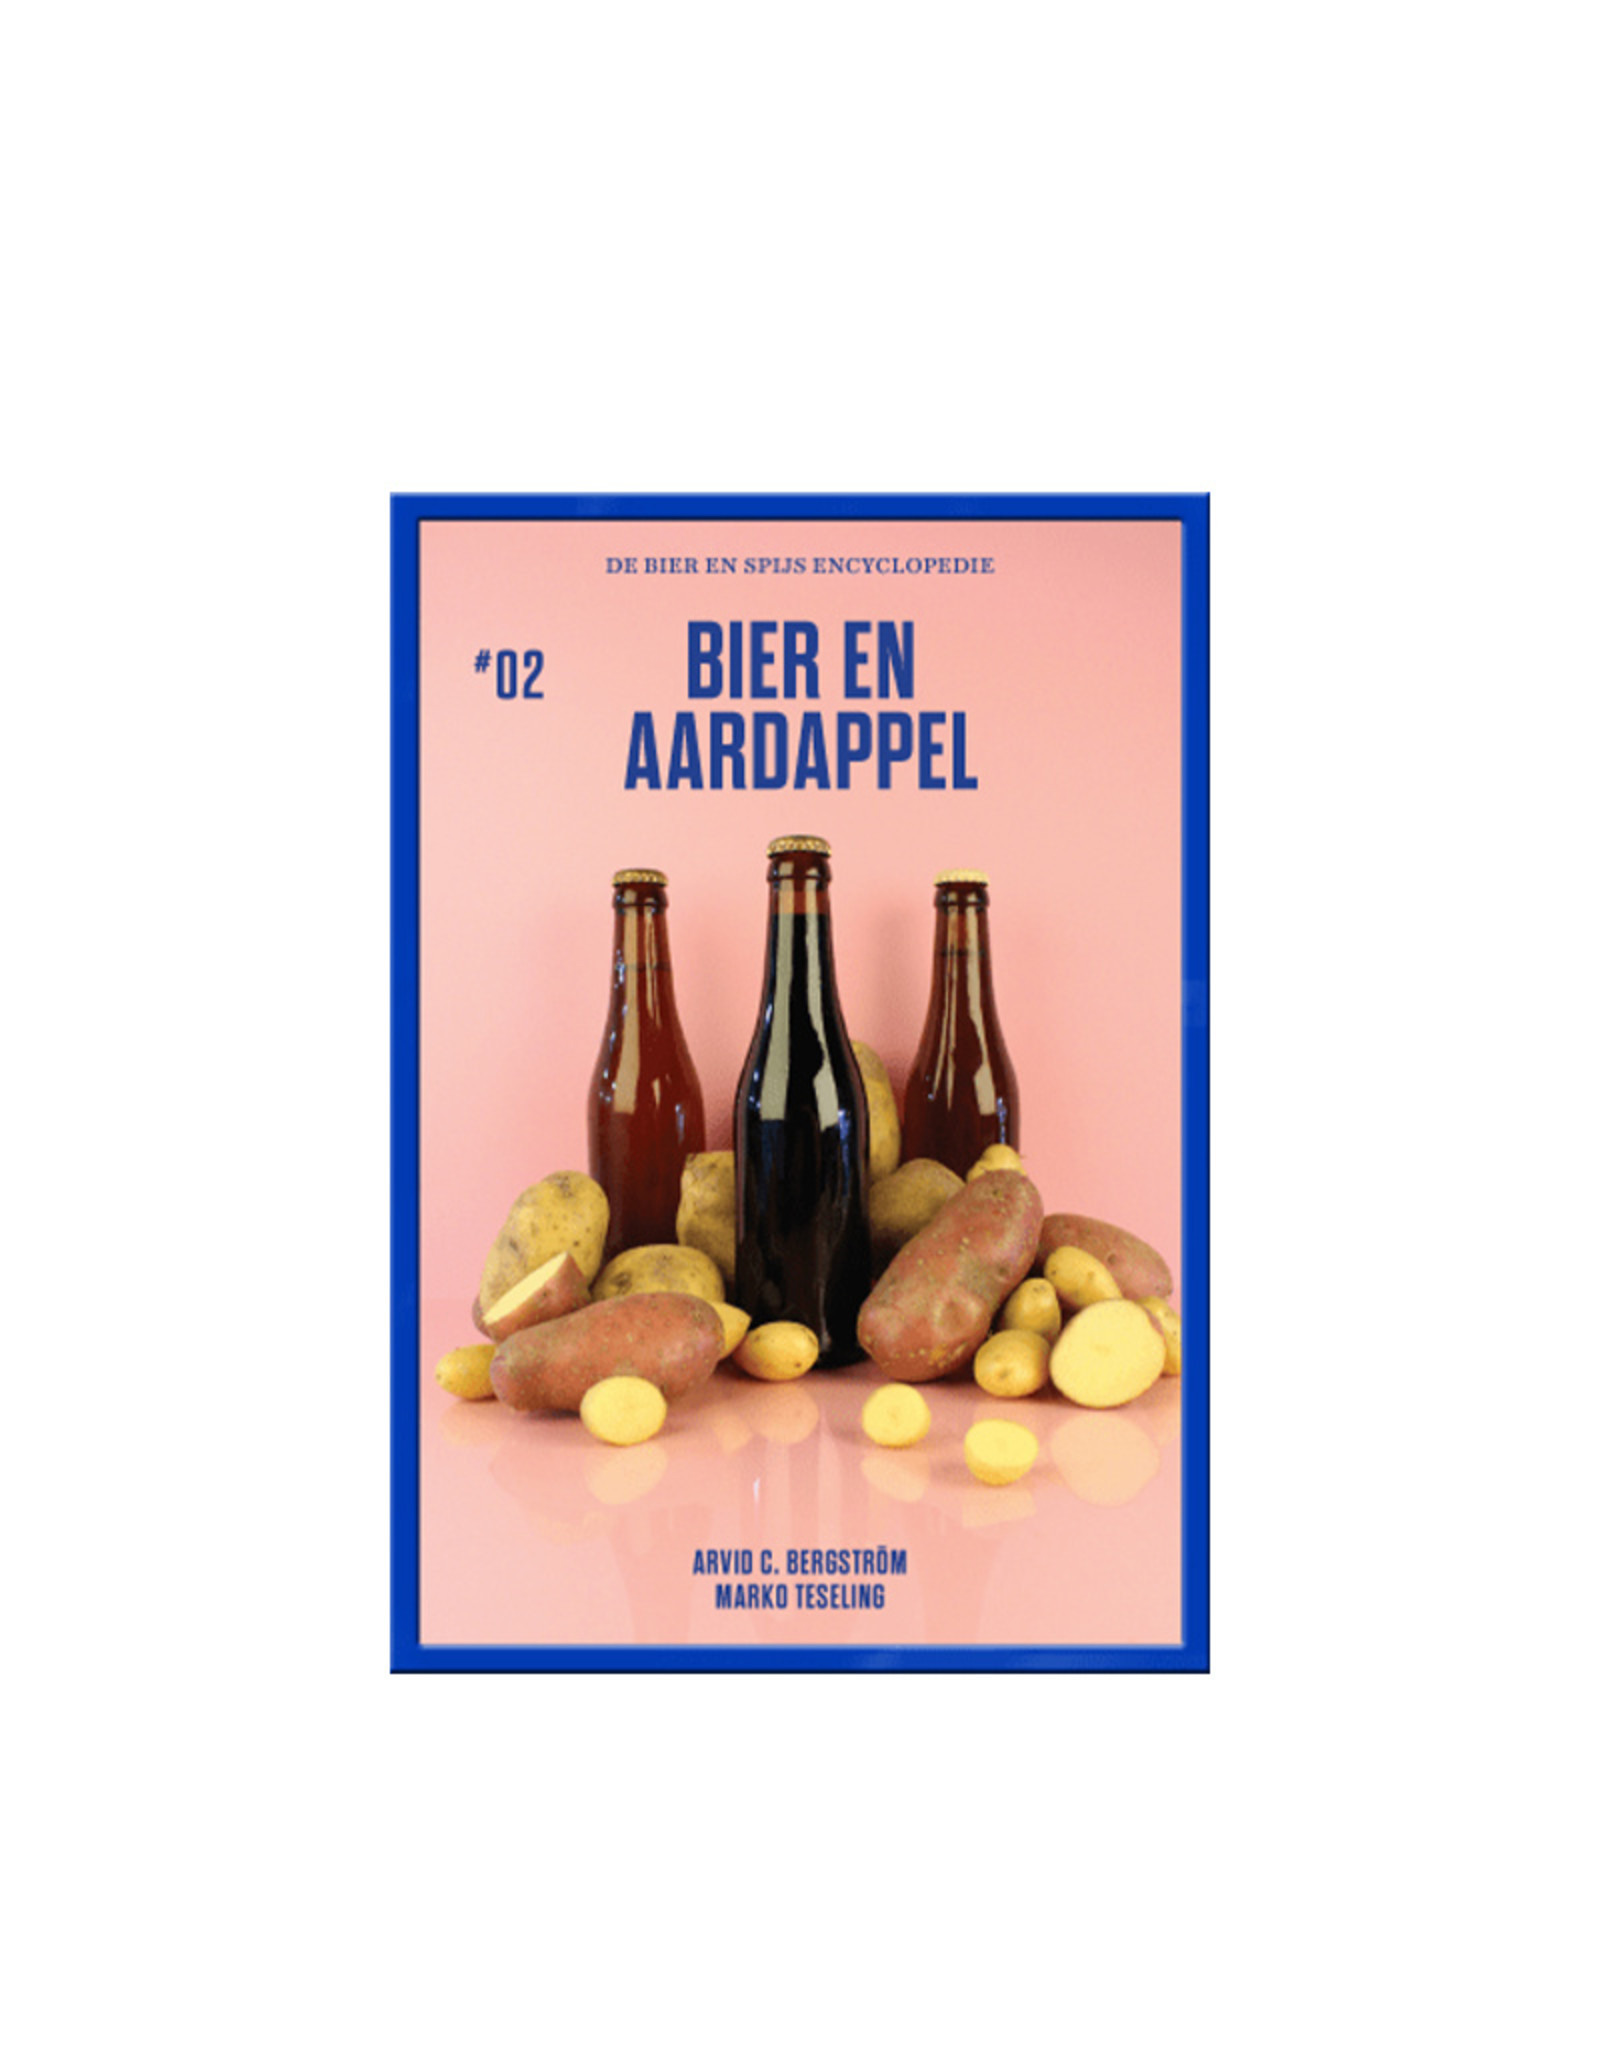 Arvid C. Bergstrom Bier en Aardappel